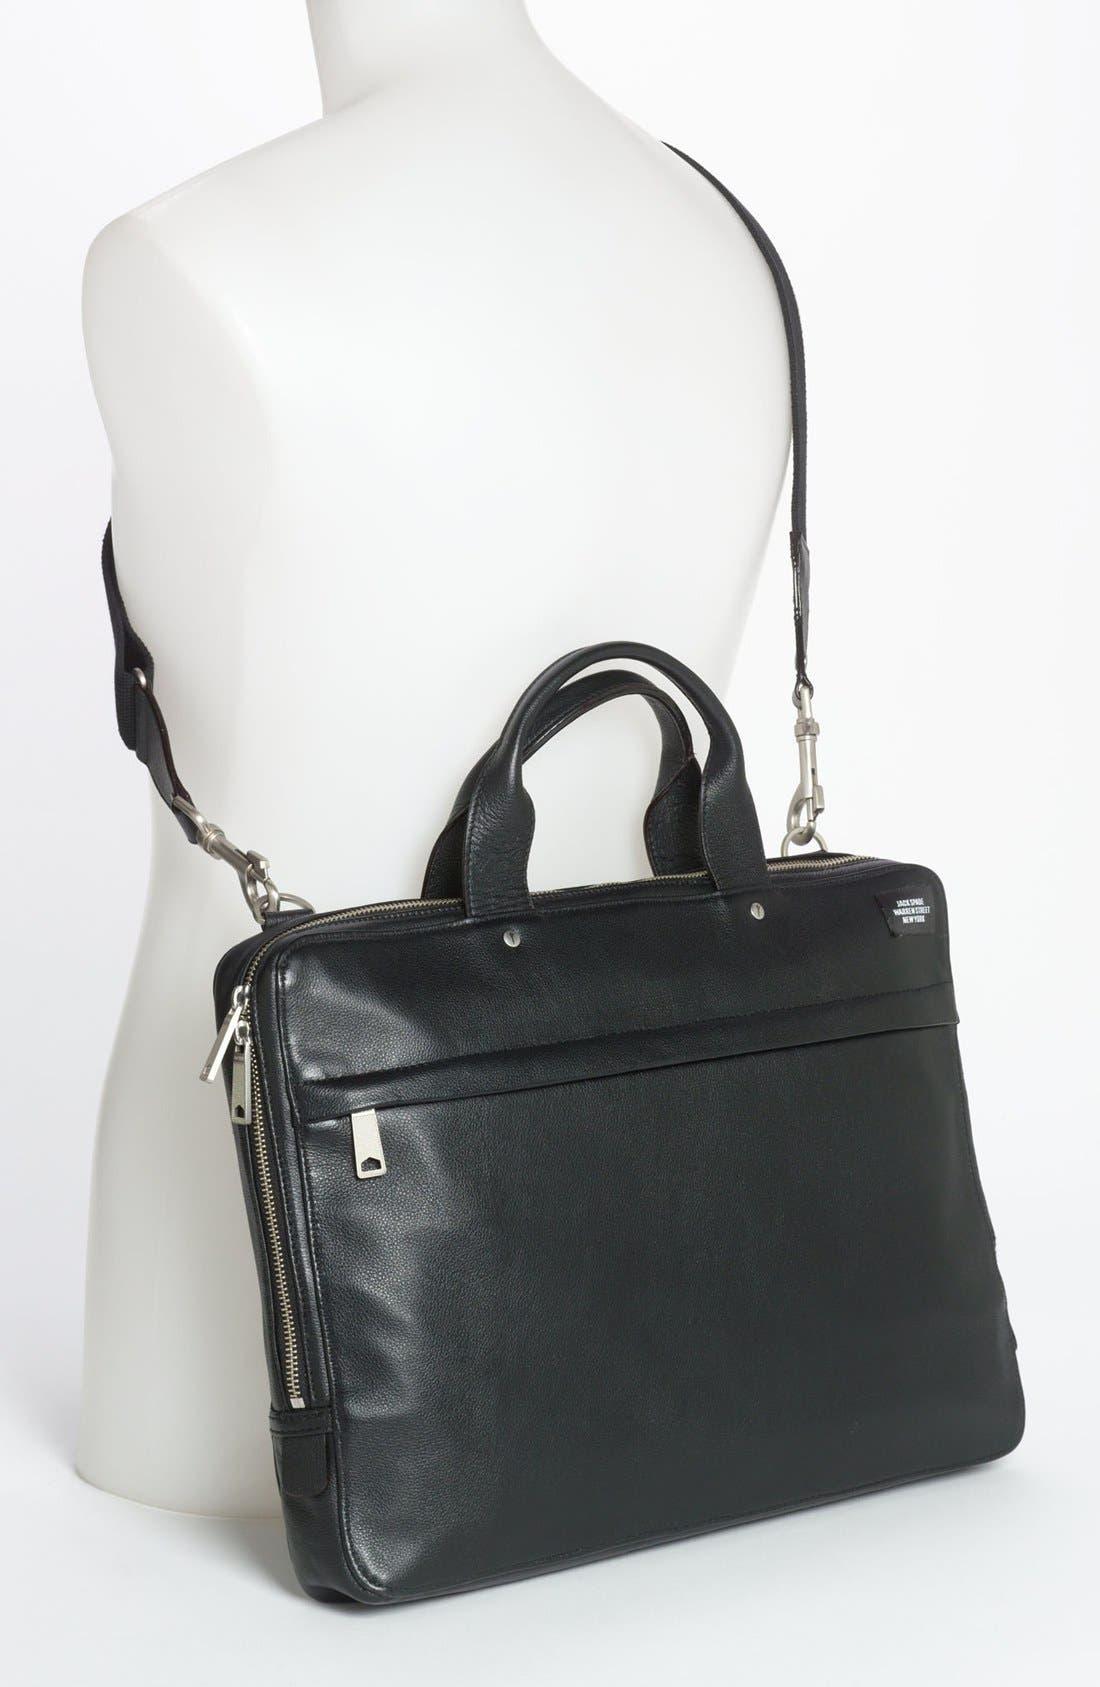 JACK SPADE, Slim Leather Briefcase, Alternate thumbnail 2, color, 001